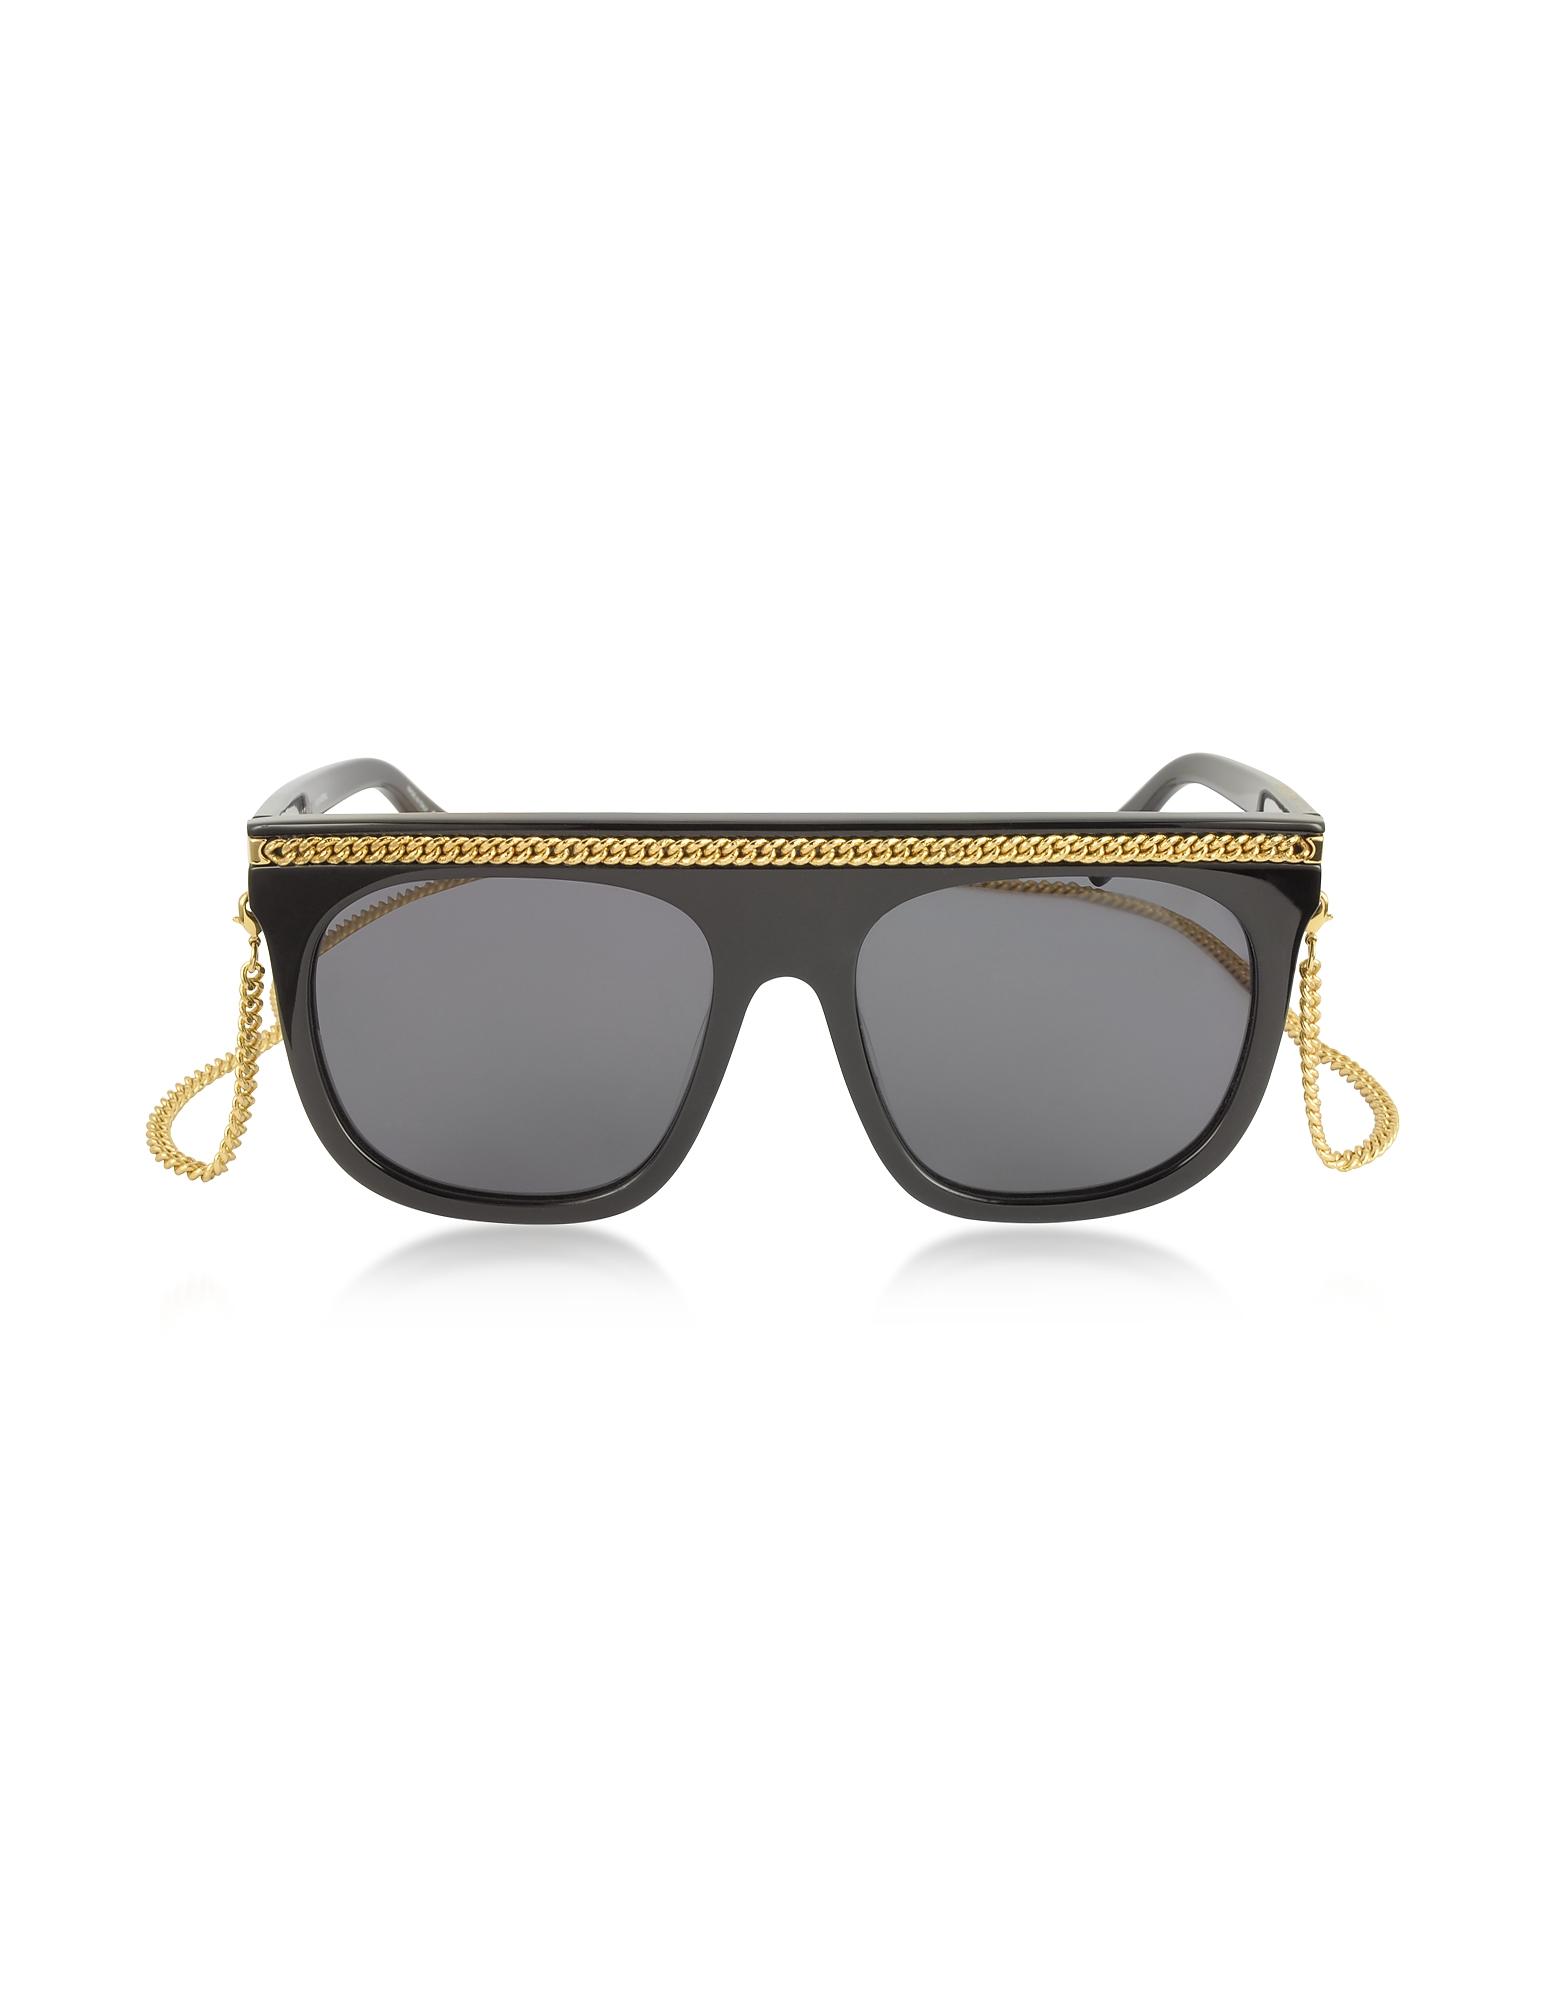 Stella McCartney Sunglasses, SC0043S Acetate Shield Women's Sunglasses w/Goldtone Chain